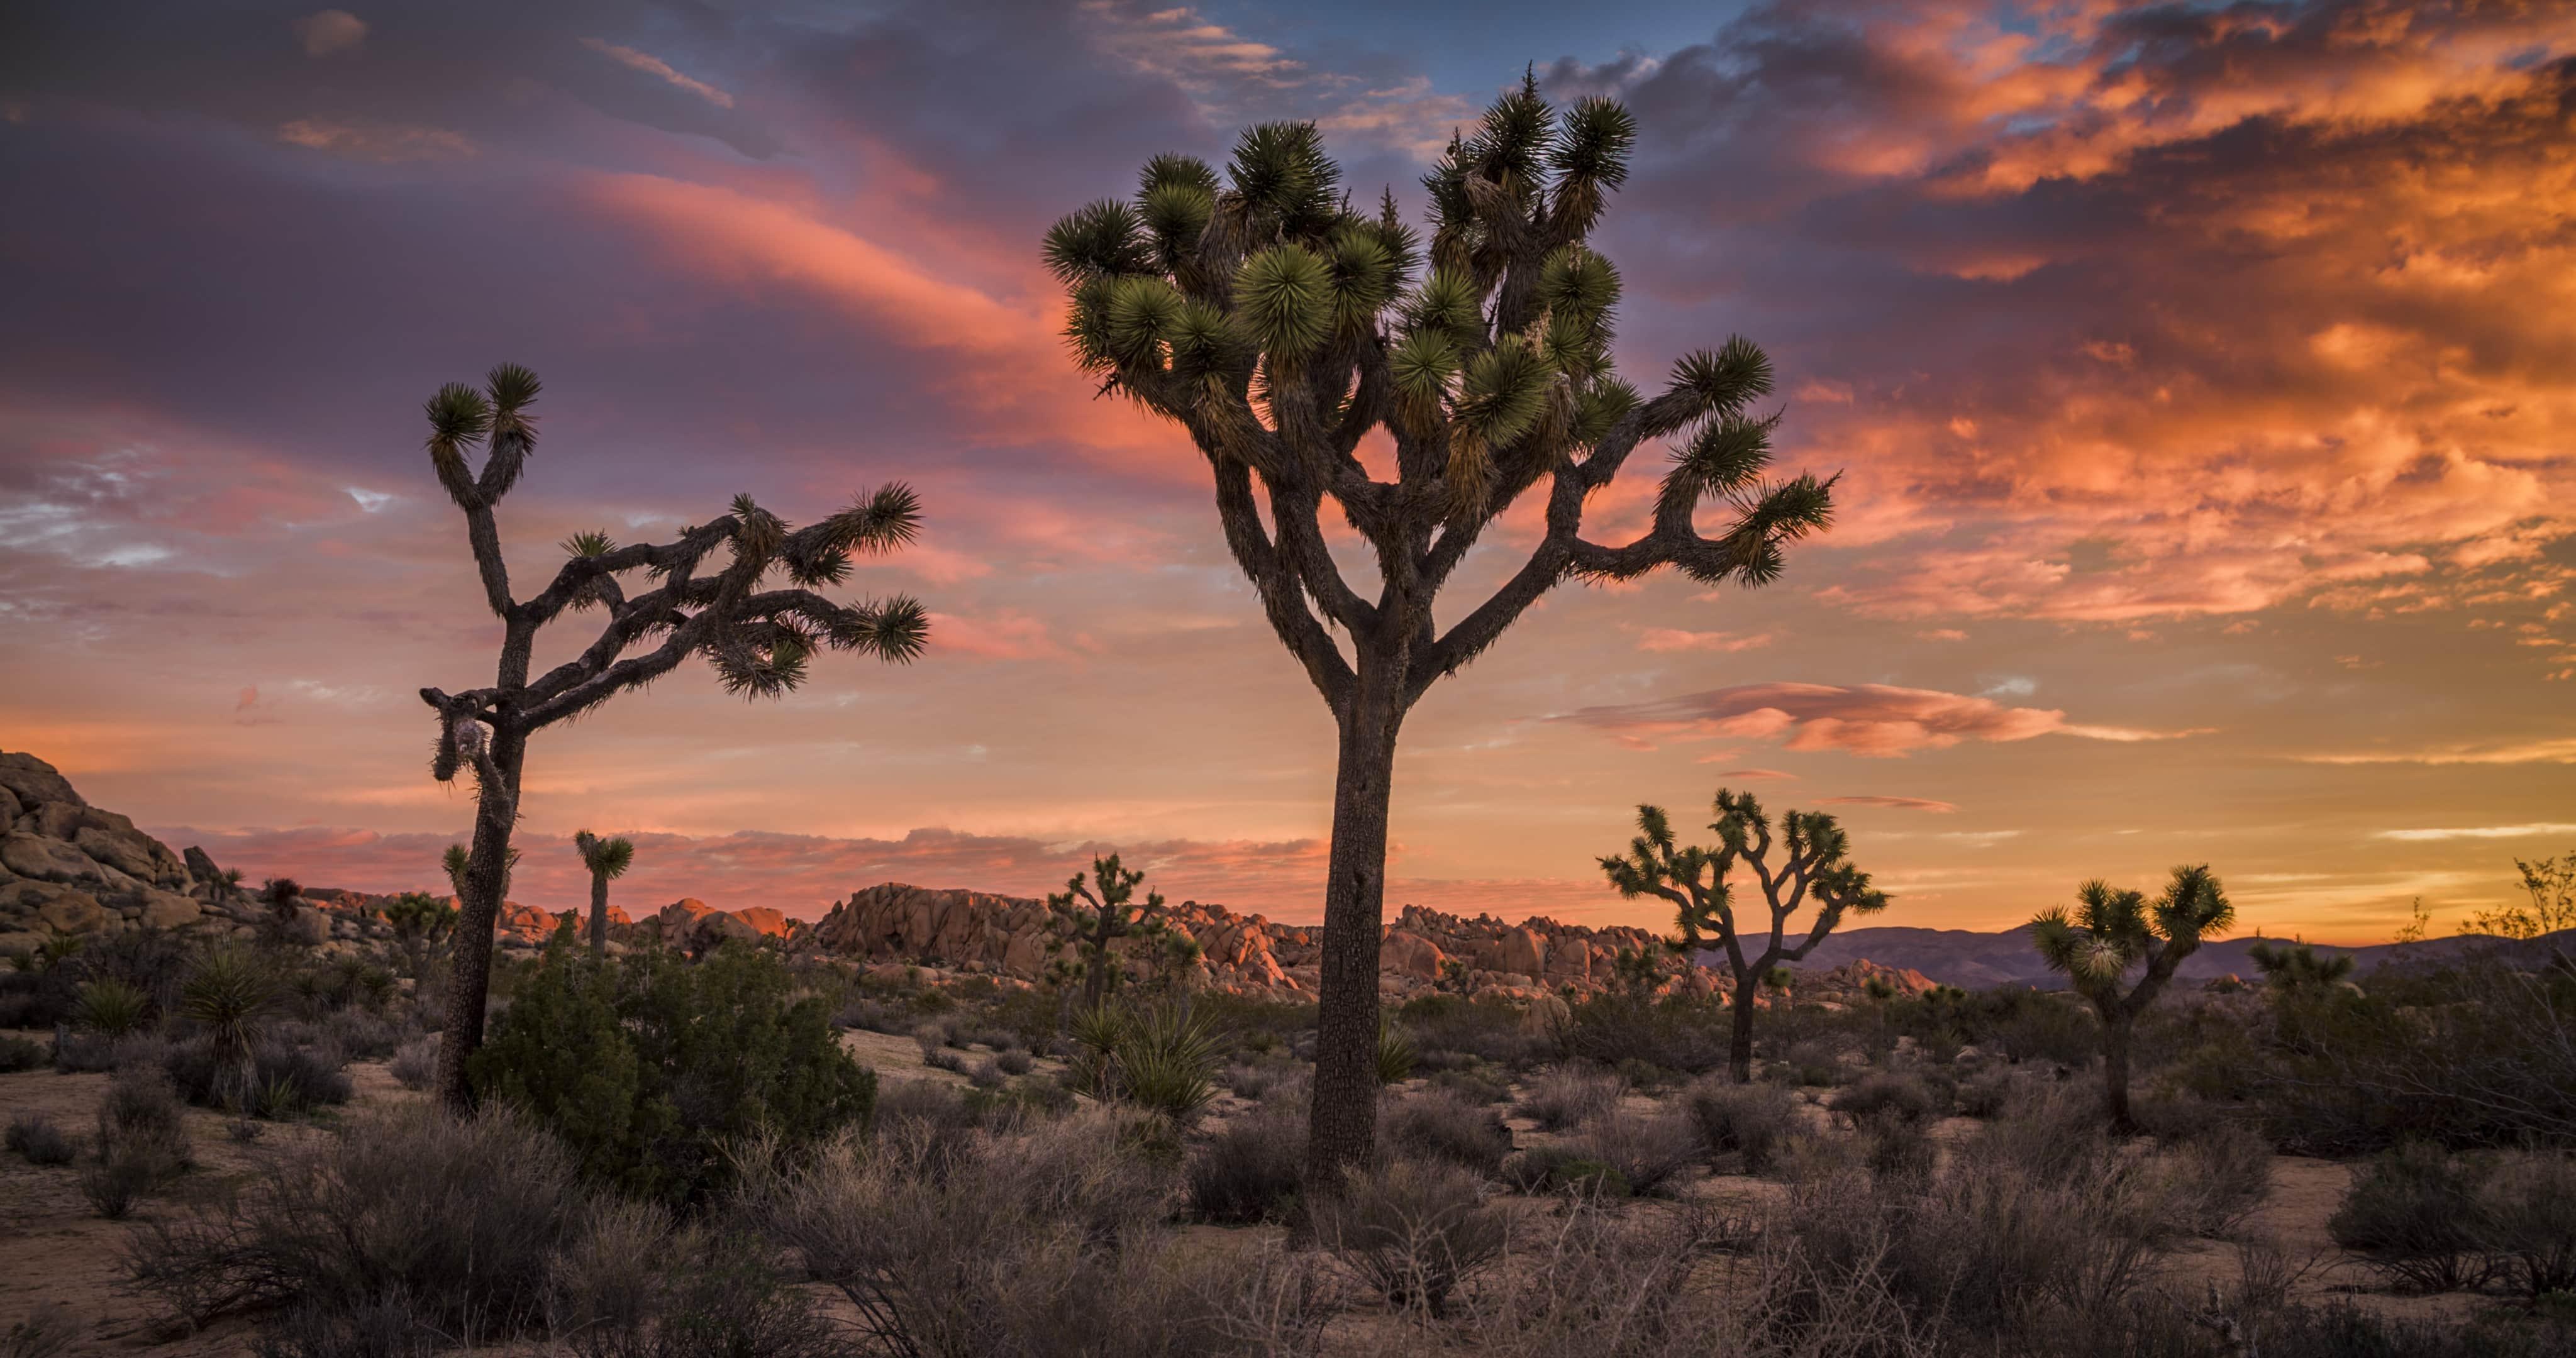 common landscape photography problems image